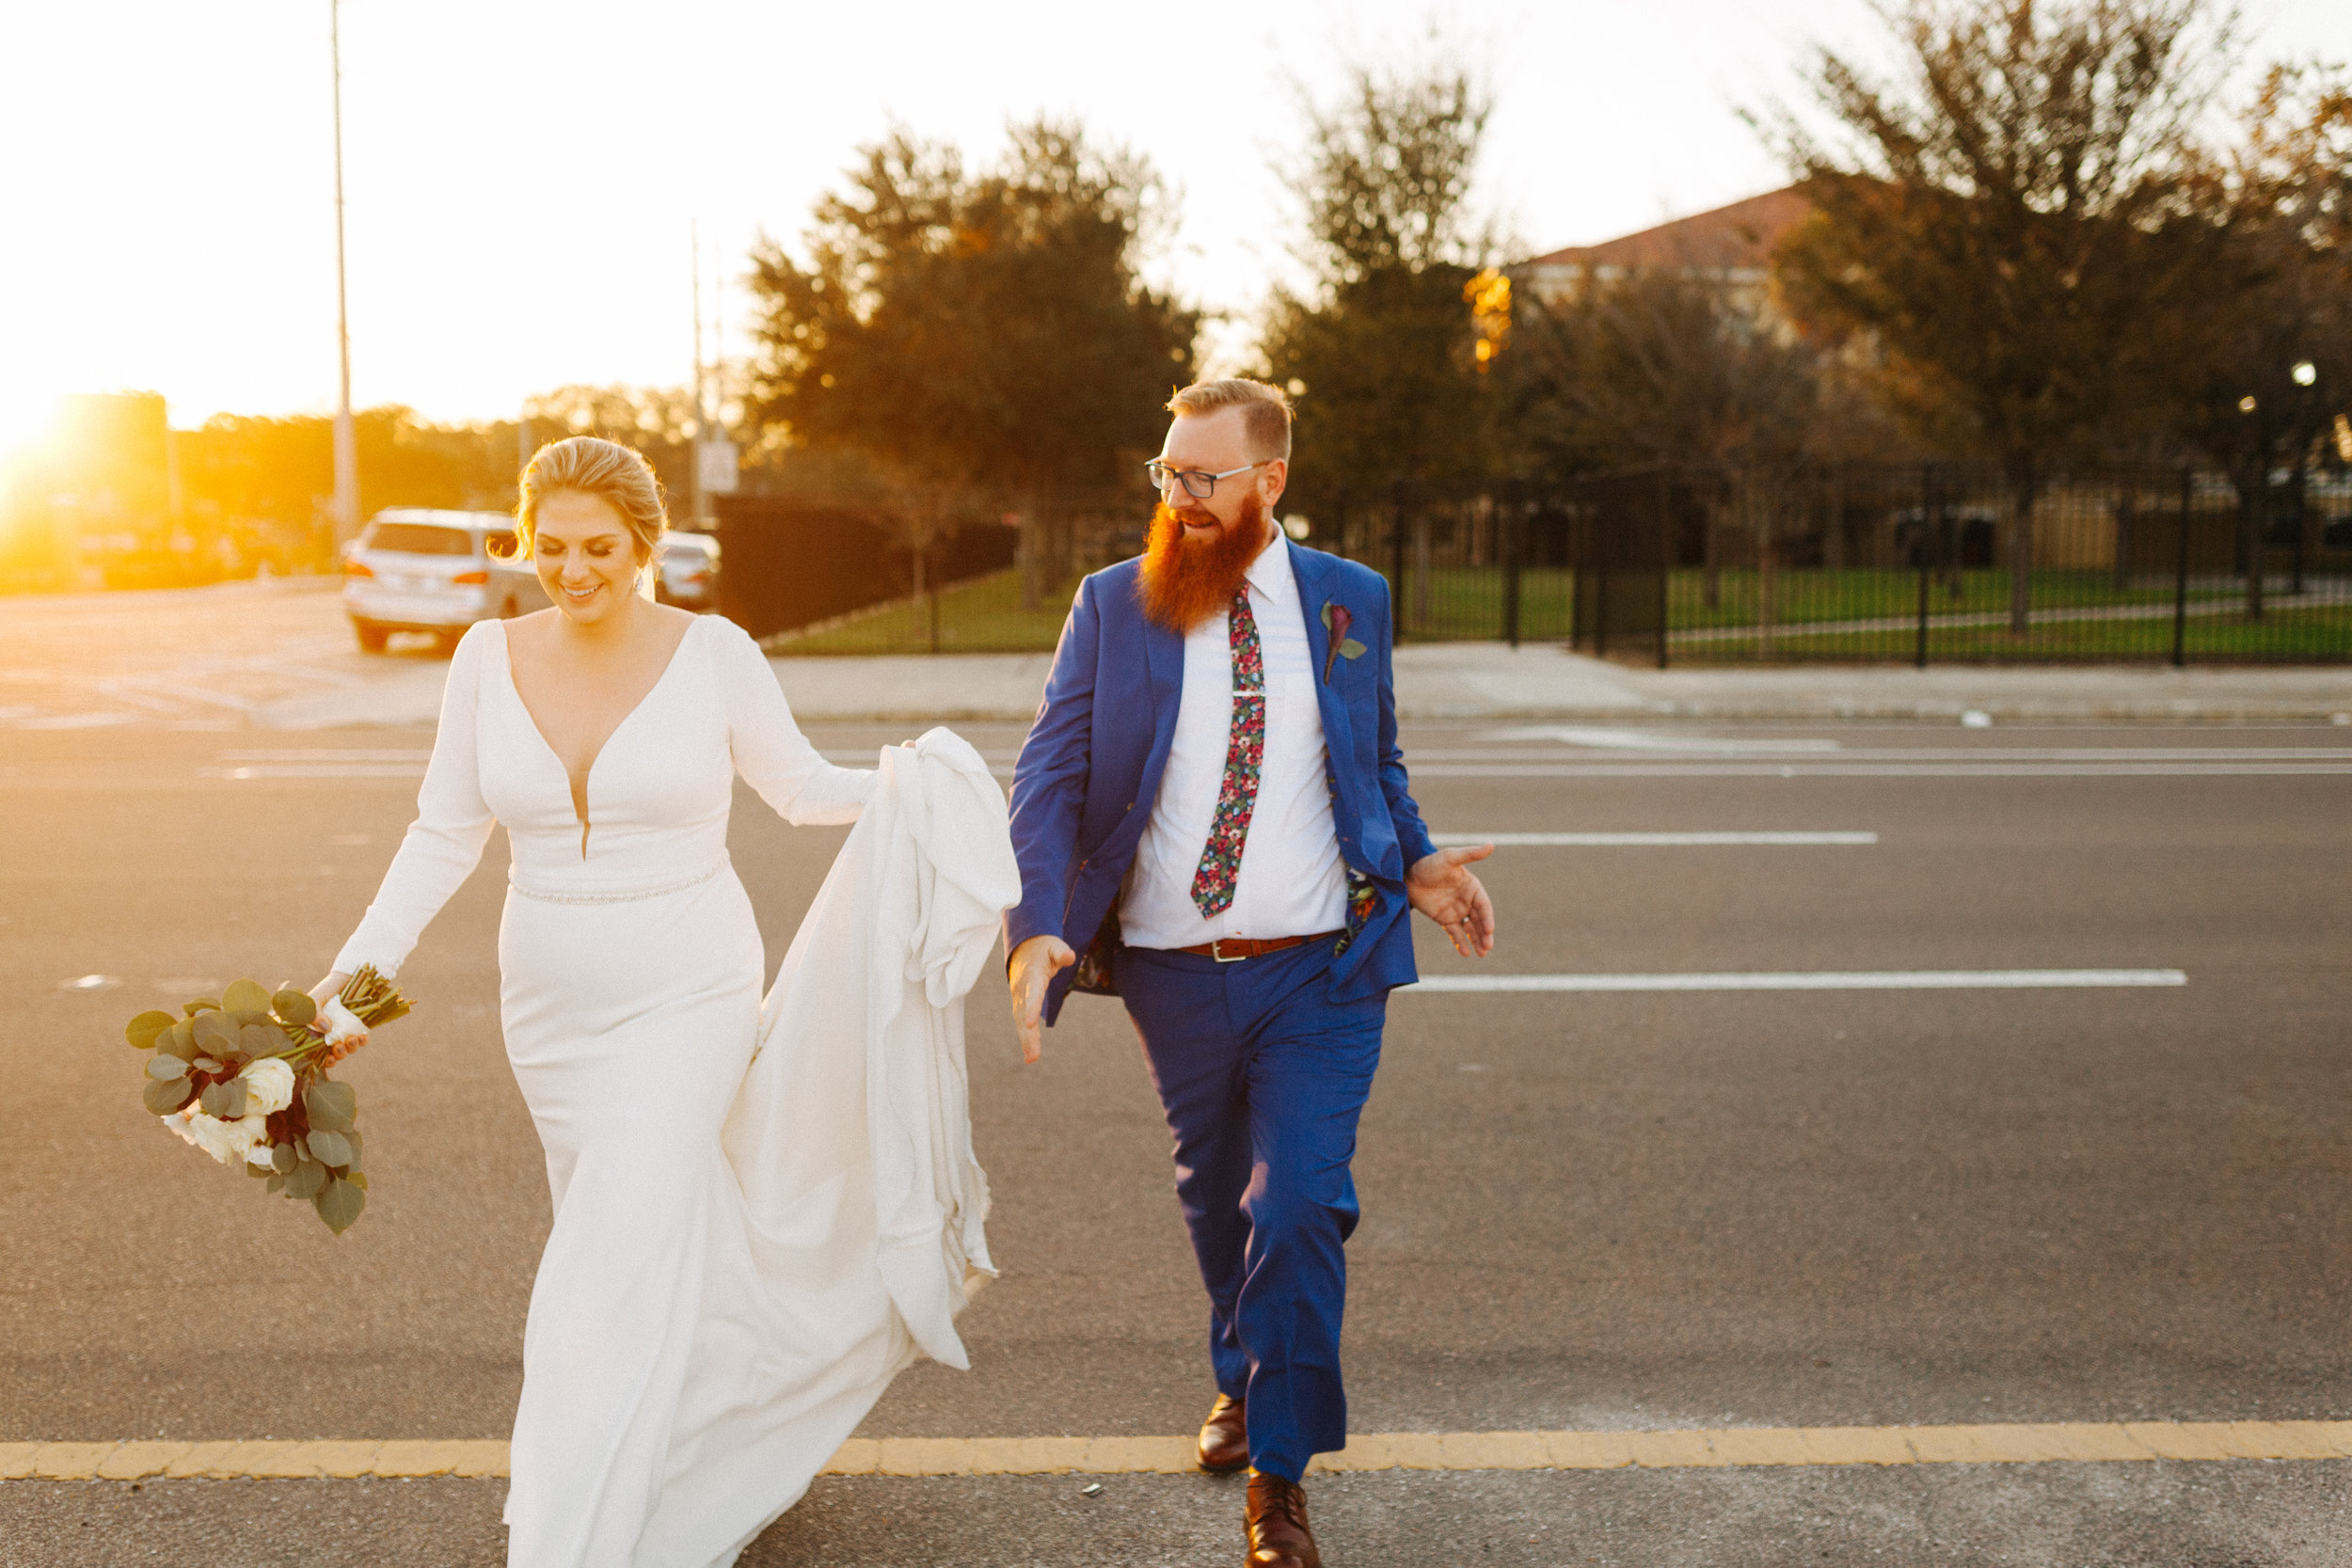 Mike & Heather - Portraits - Jake & Katie Photography_254.jpg